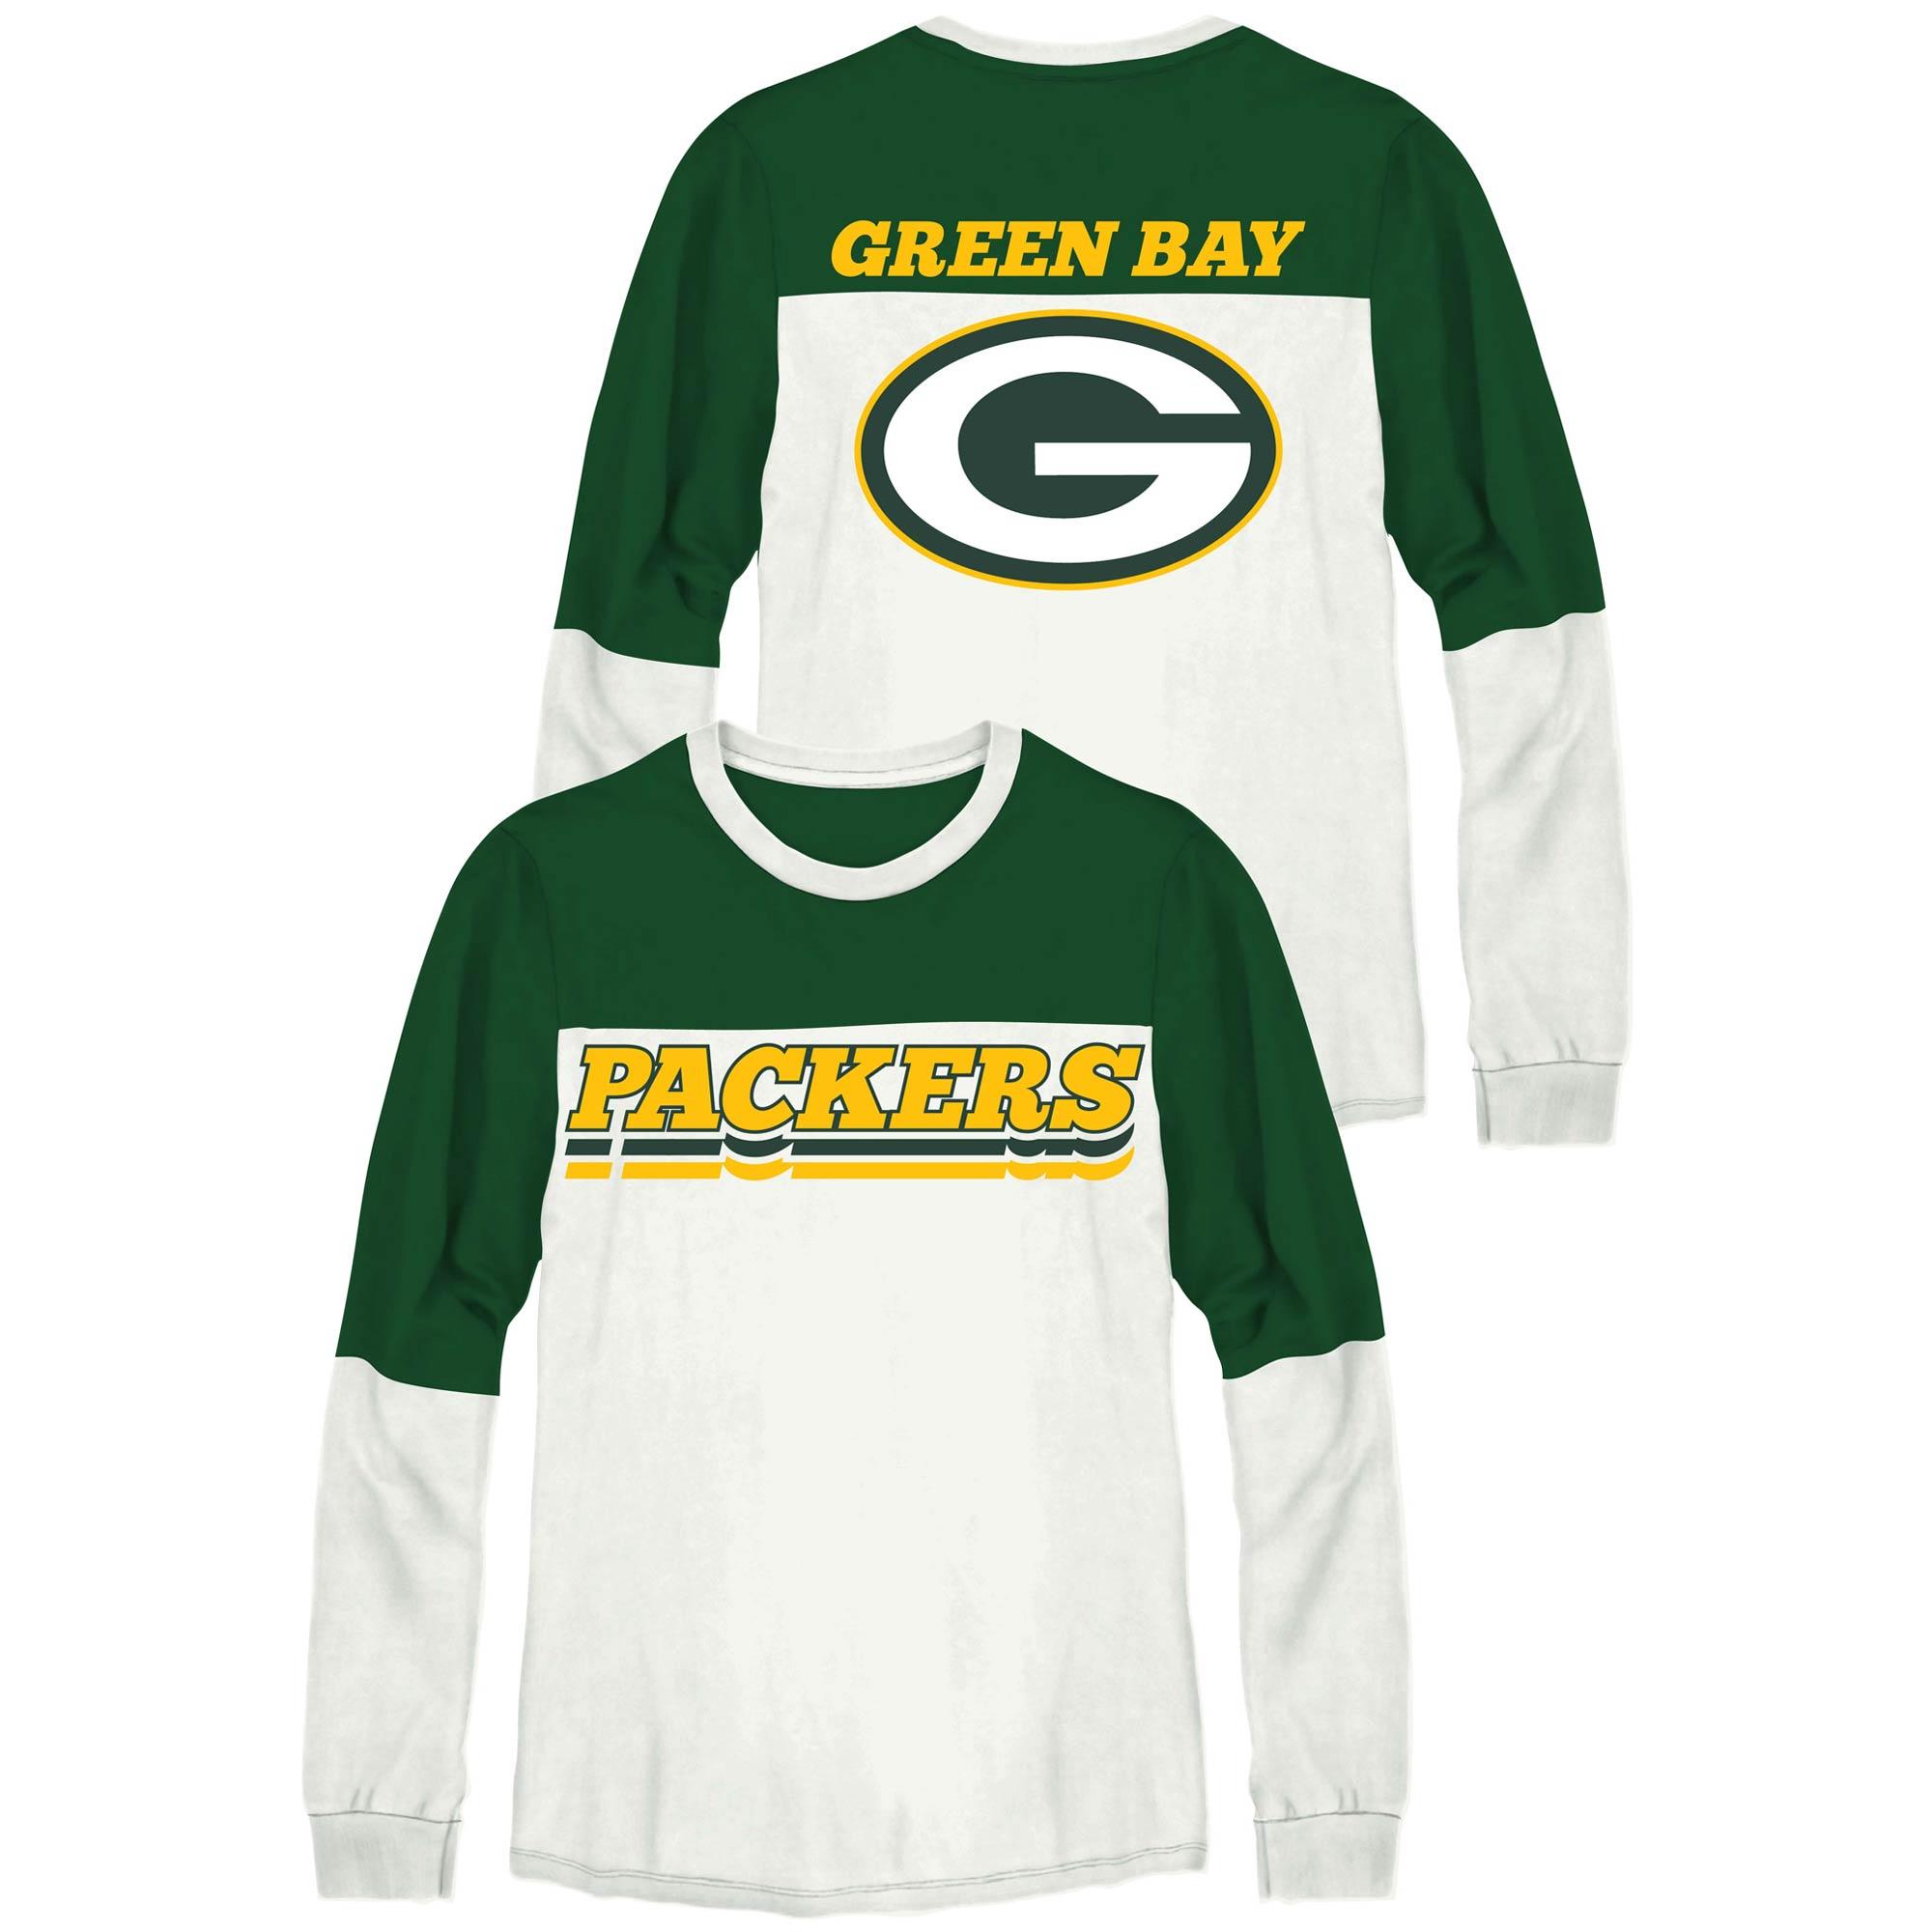 Green Bay Packers Junk Food Women's Comeback Long Sleeve T-Shirt - Green/White